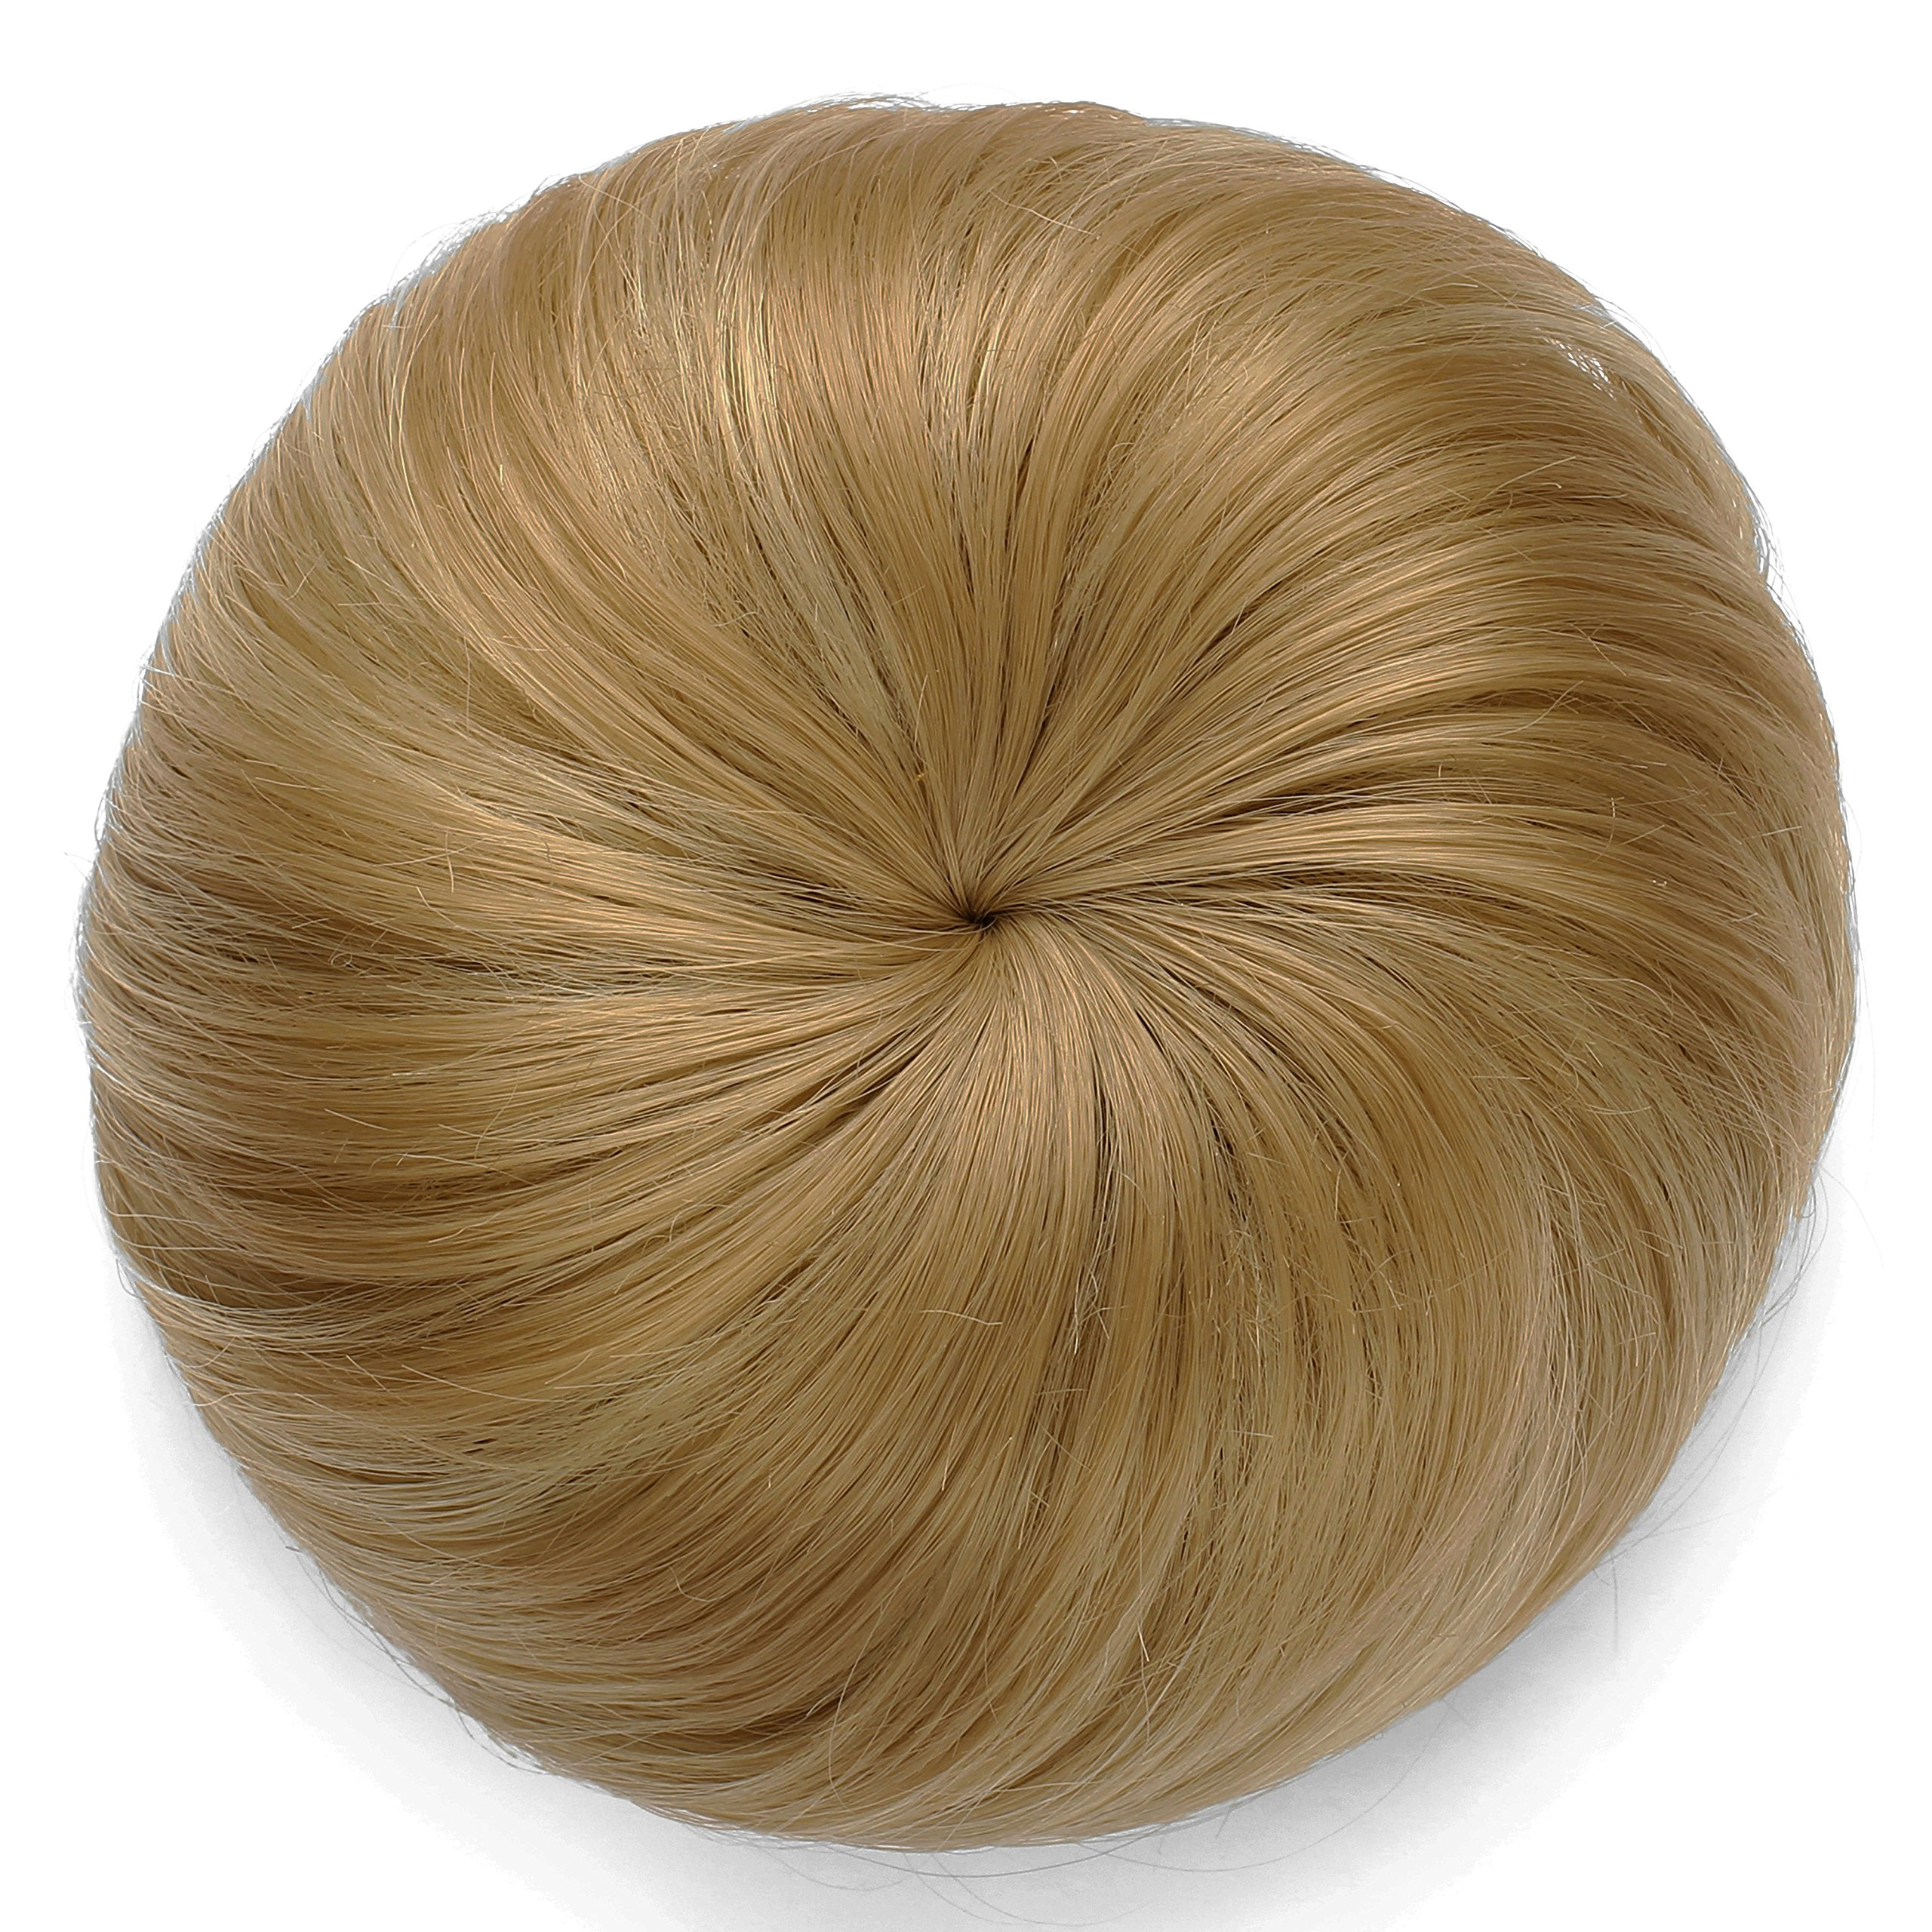 Amazon Prettyshop 100 Human Hair Up Do Ballerina Knoten Donut